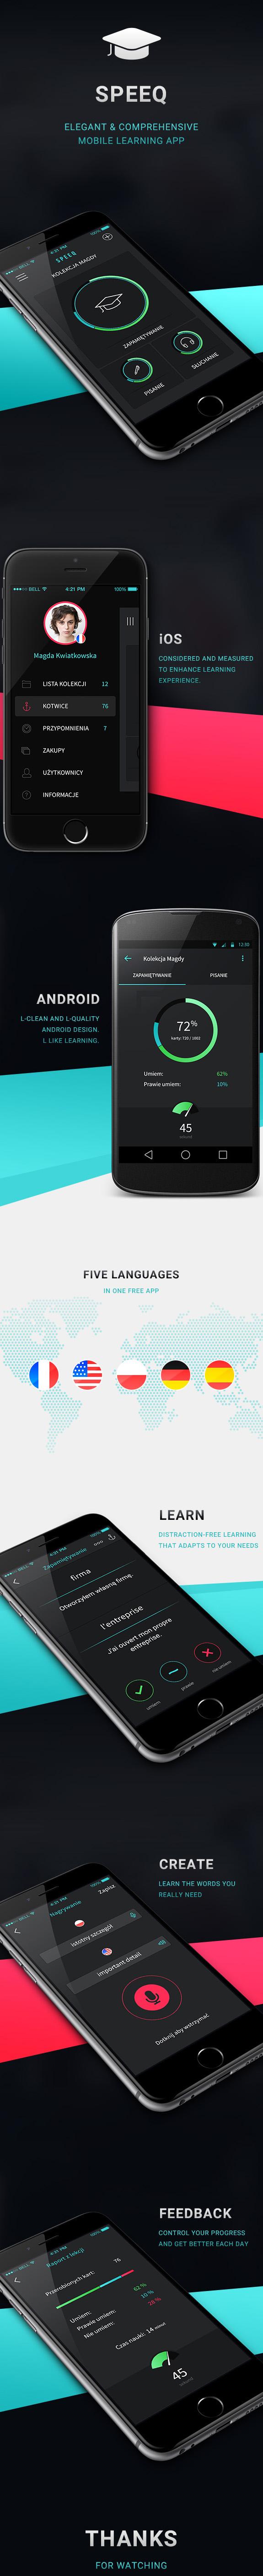 Mobile App Design Inspiration – SPEEQ Learning Mobile App